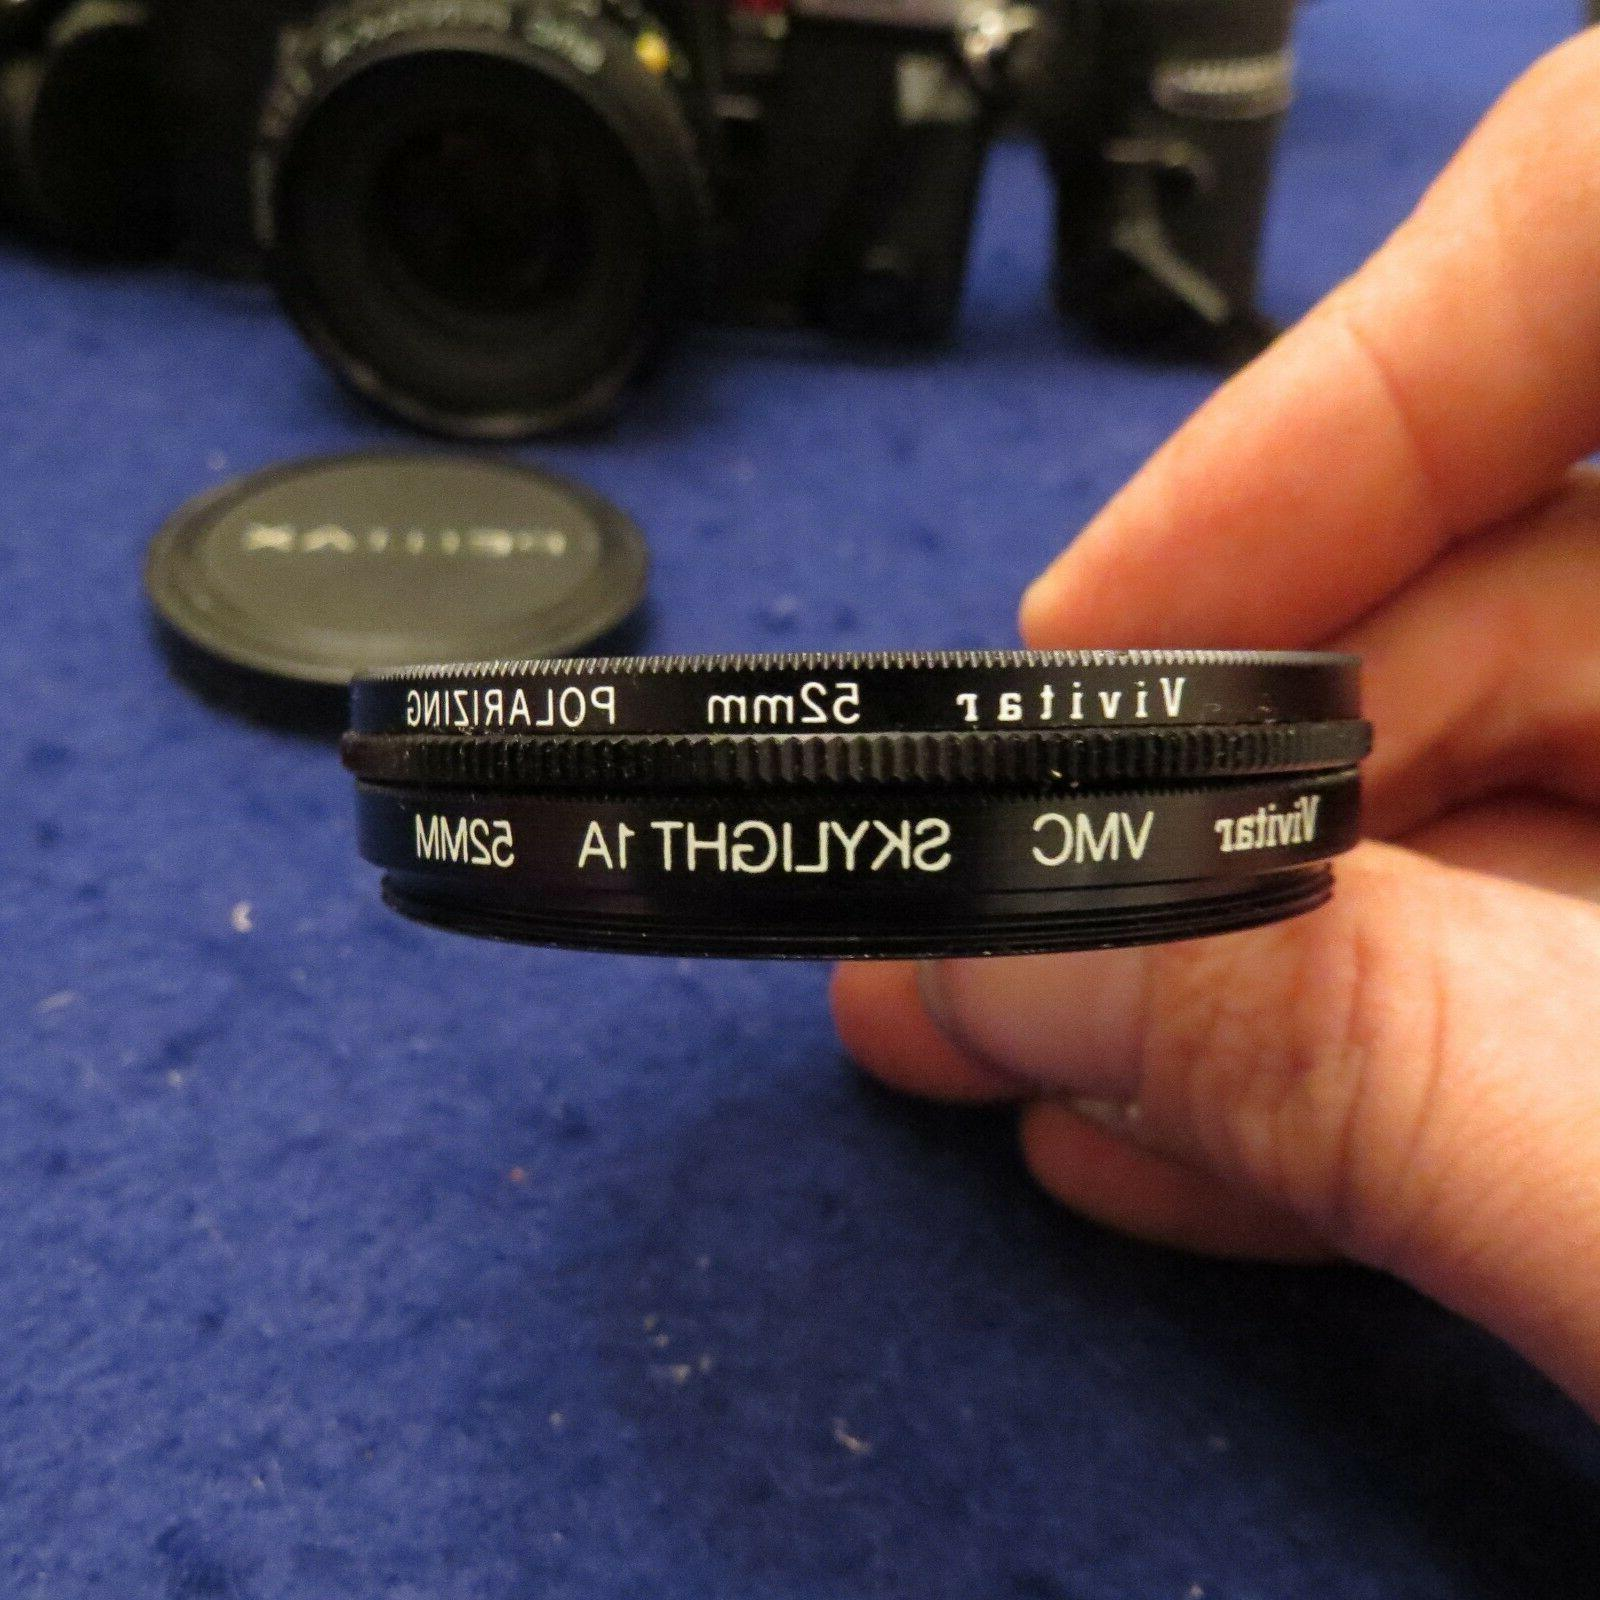 Pentax SLR Camera SMC 50mm f1.7